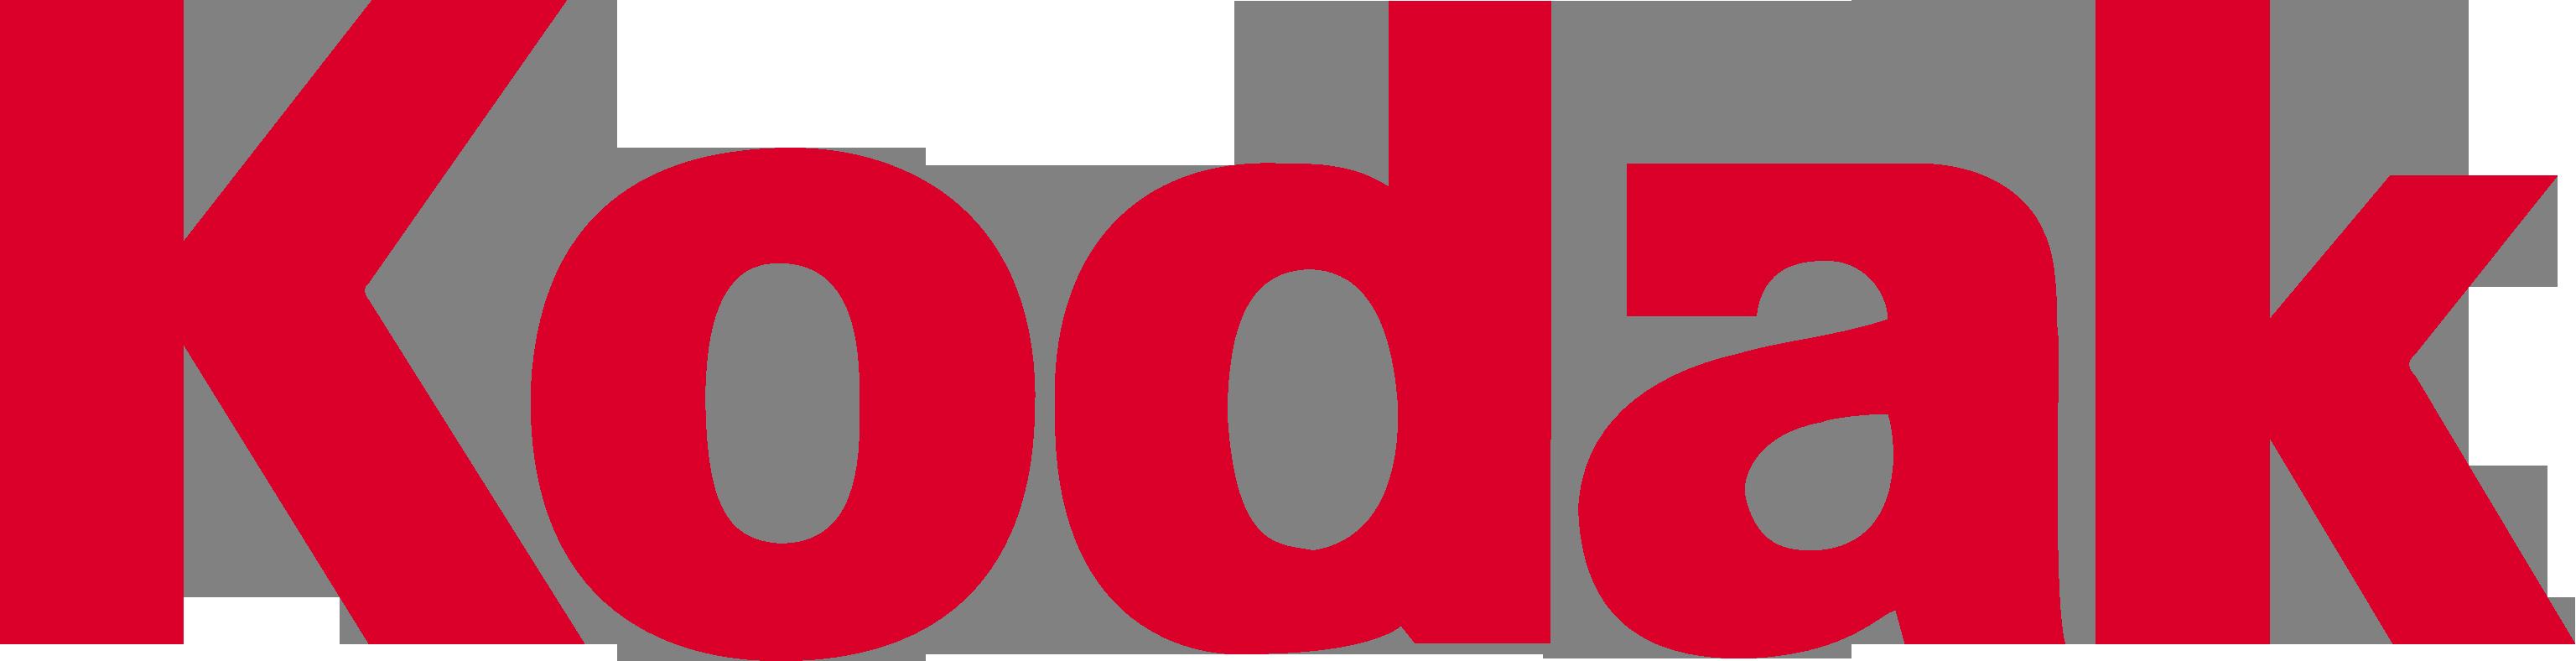 Kodak_1996